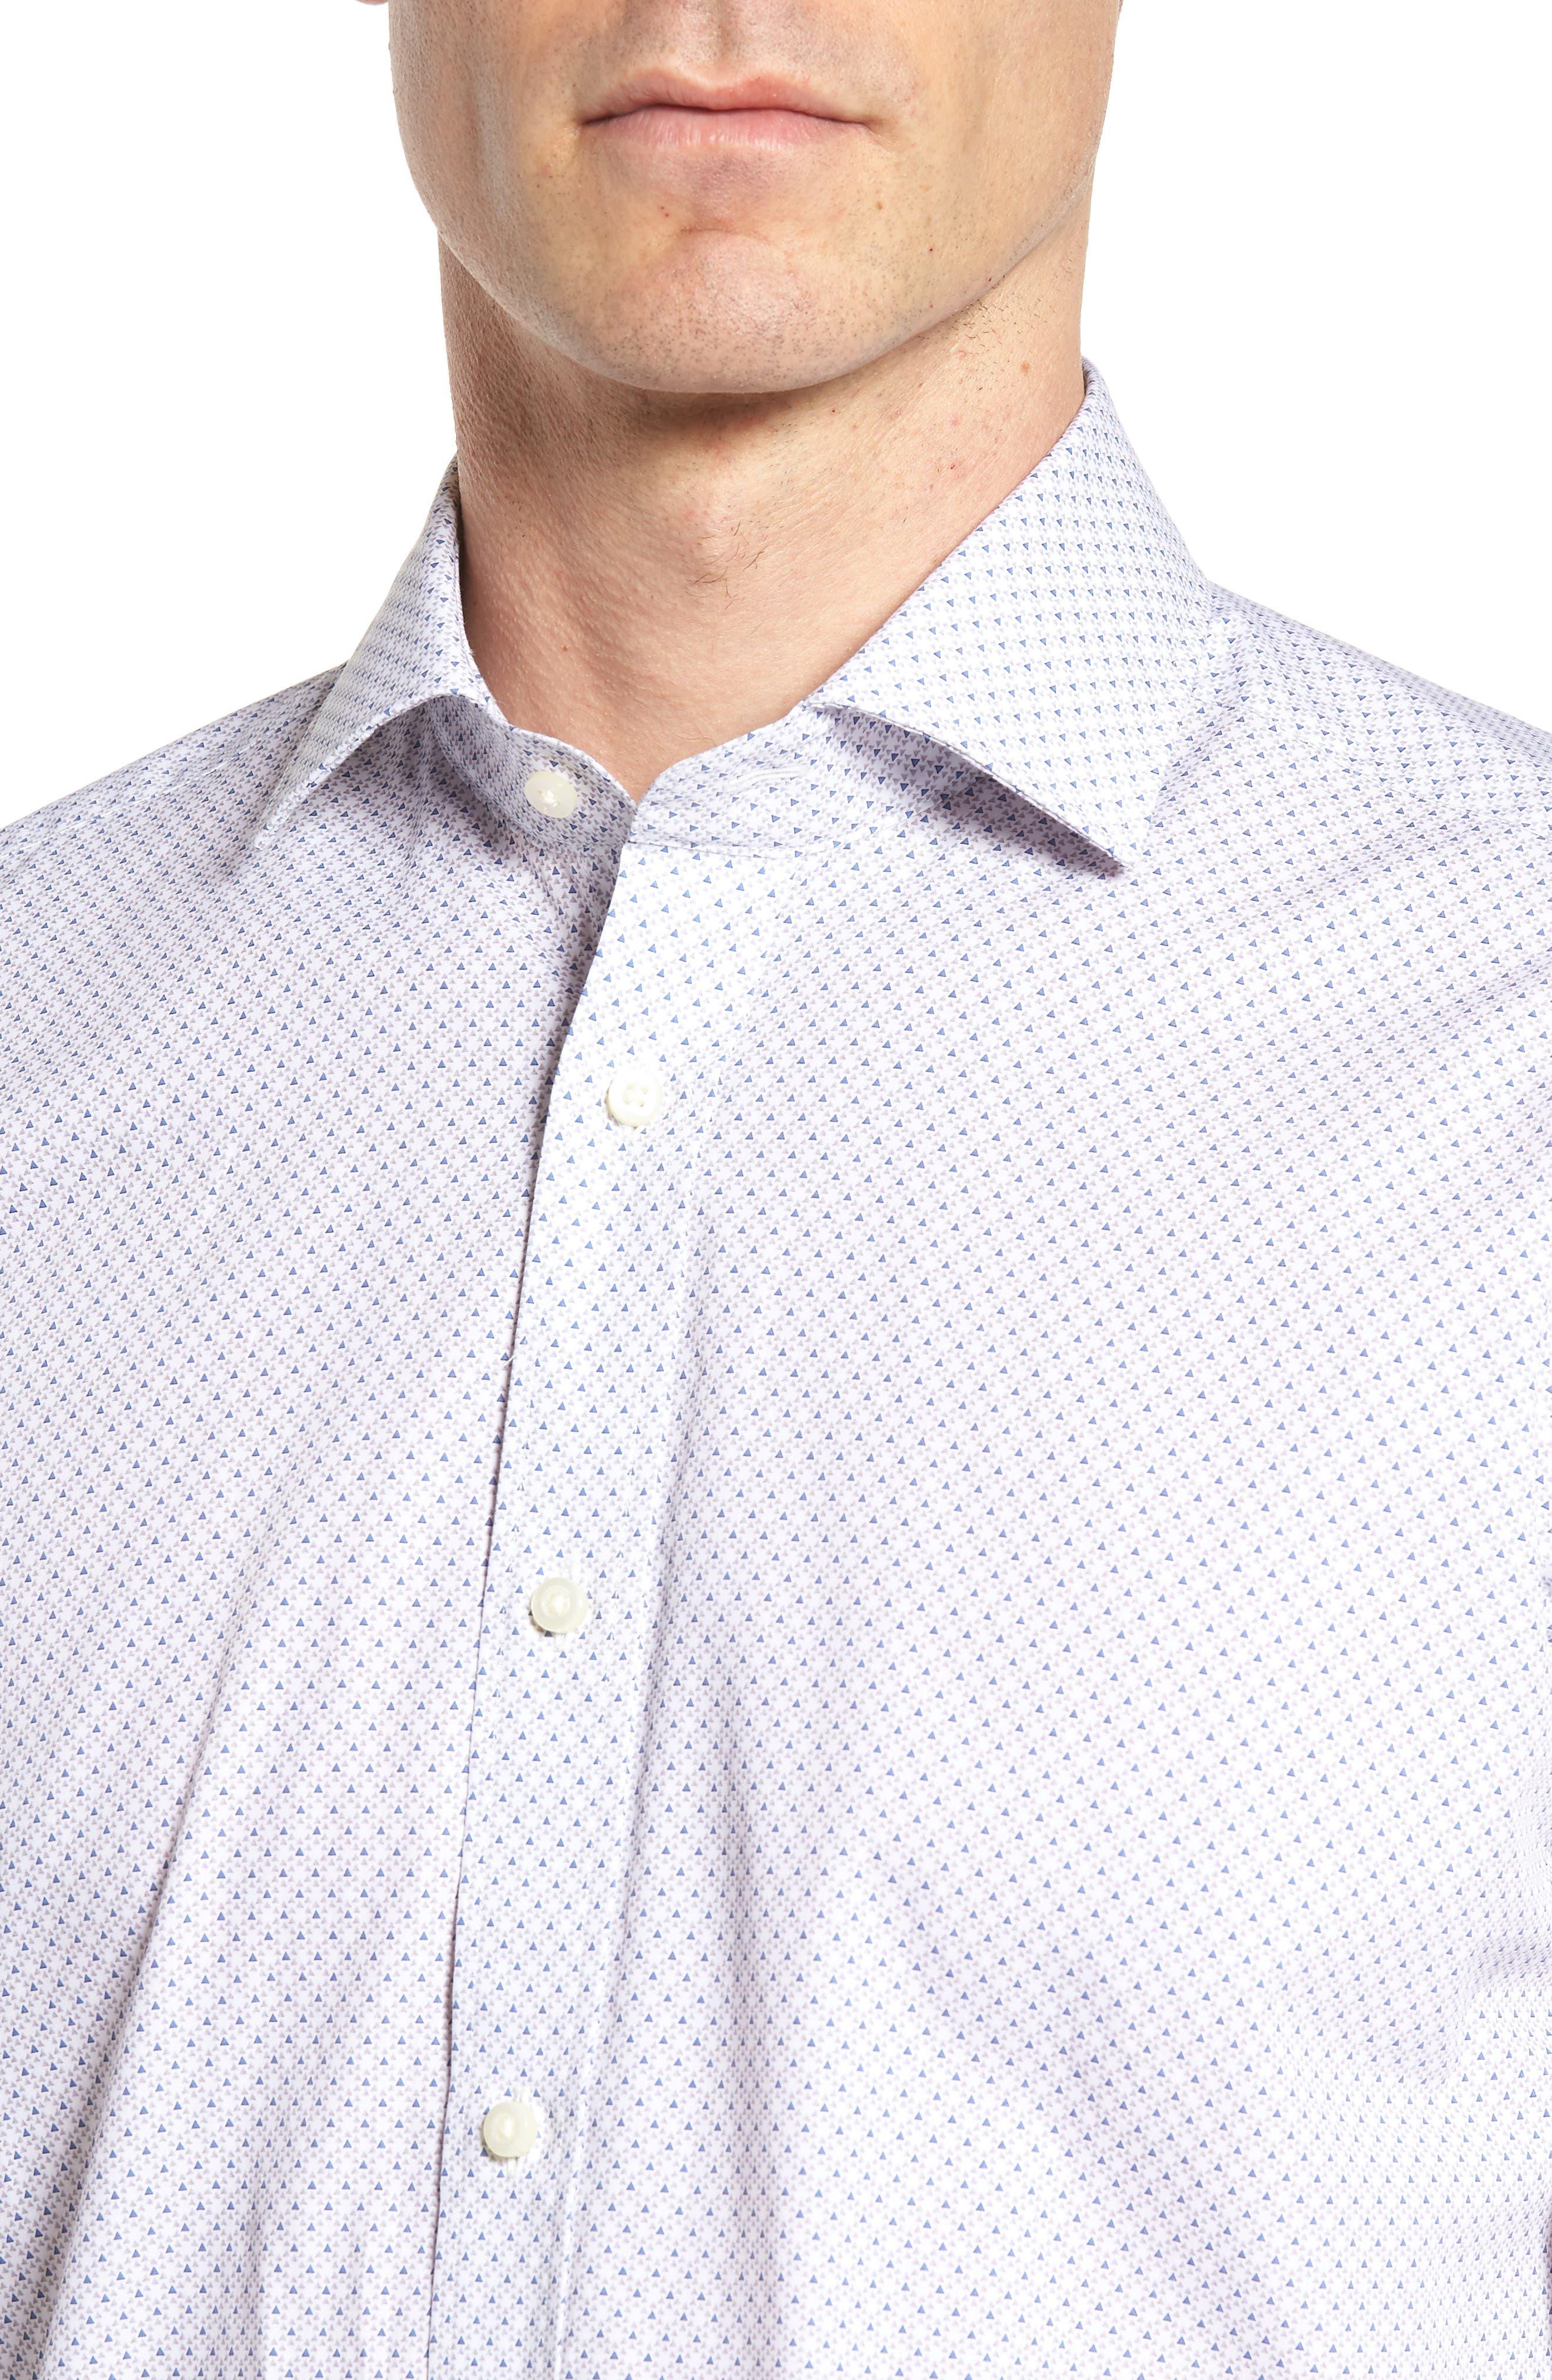 Regular Fit Print Sport Shirt,                             Alternate thumbnail 4, color,                             020